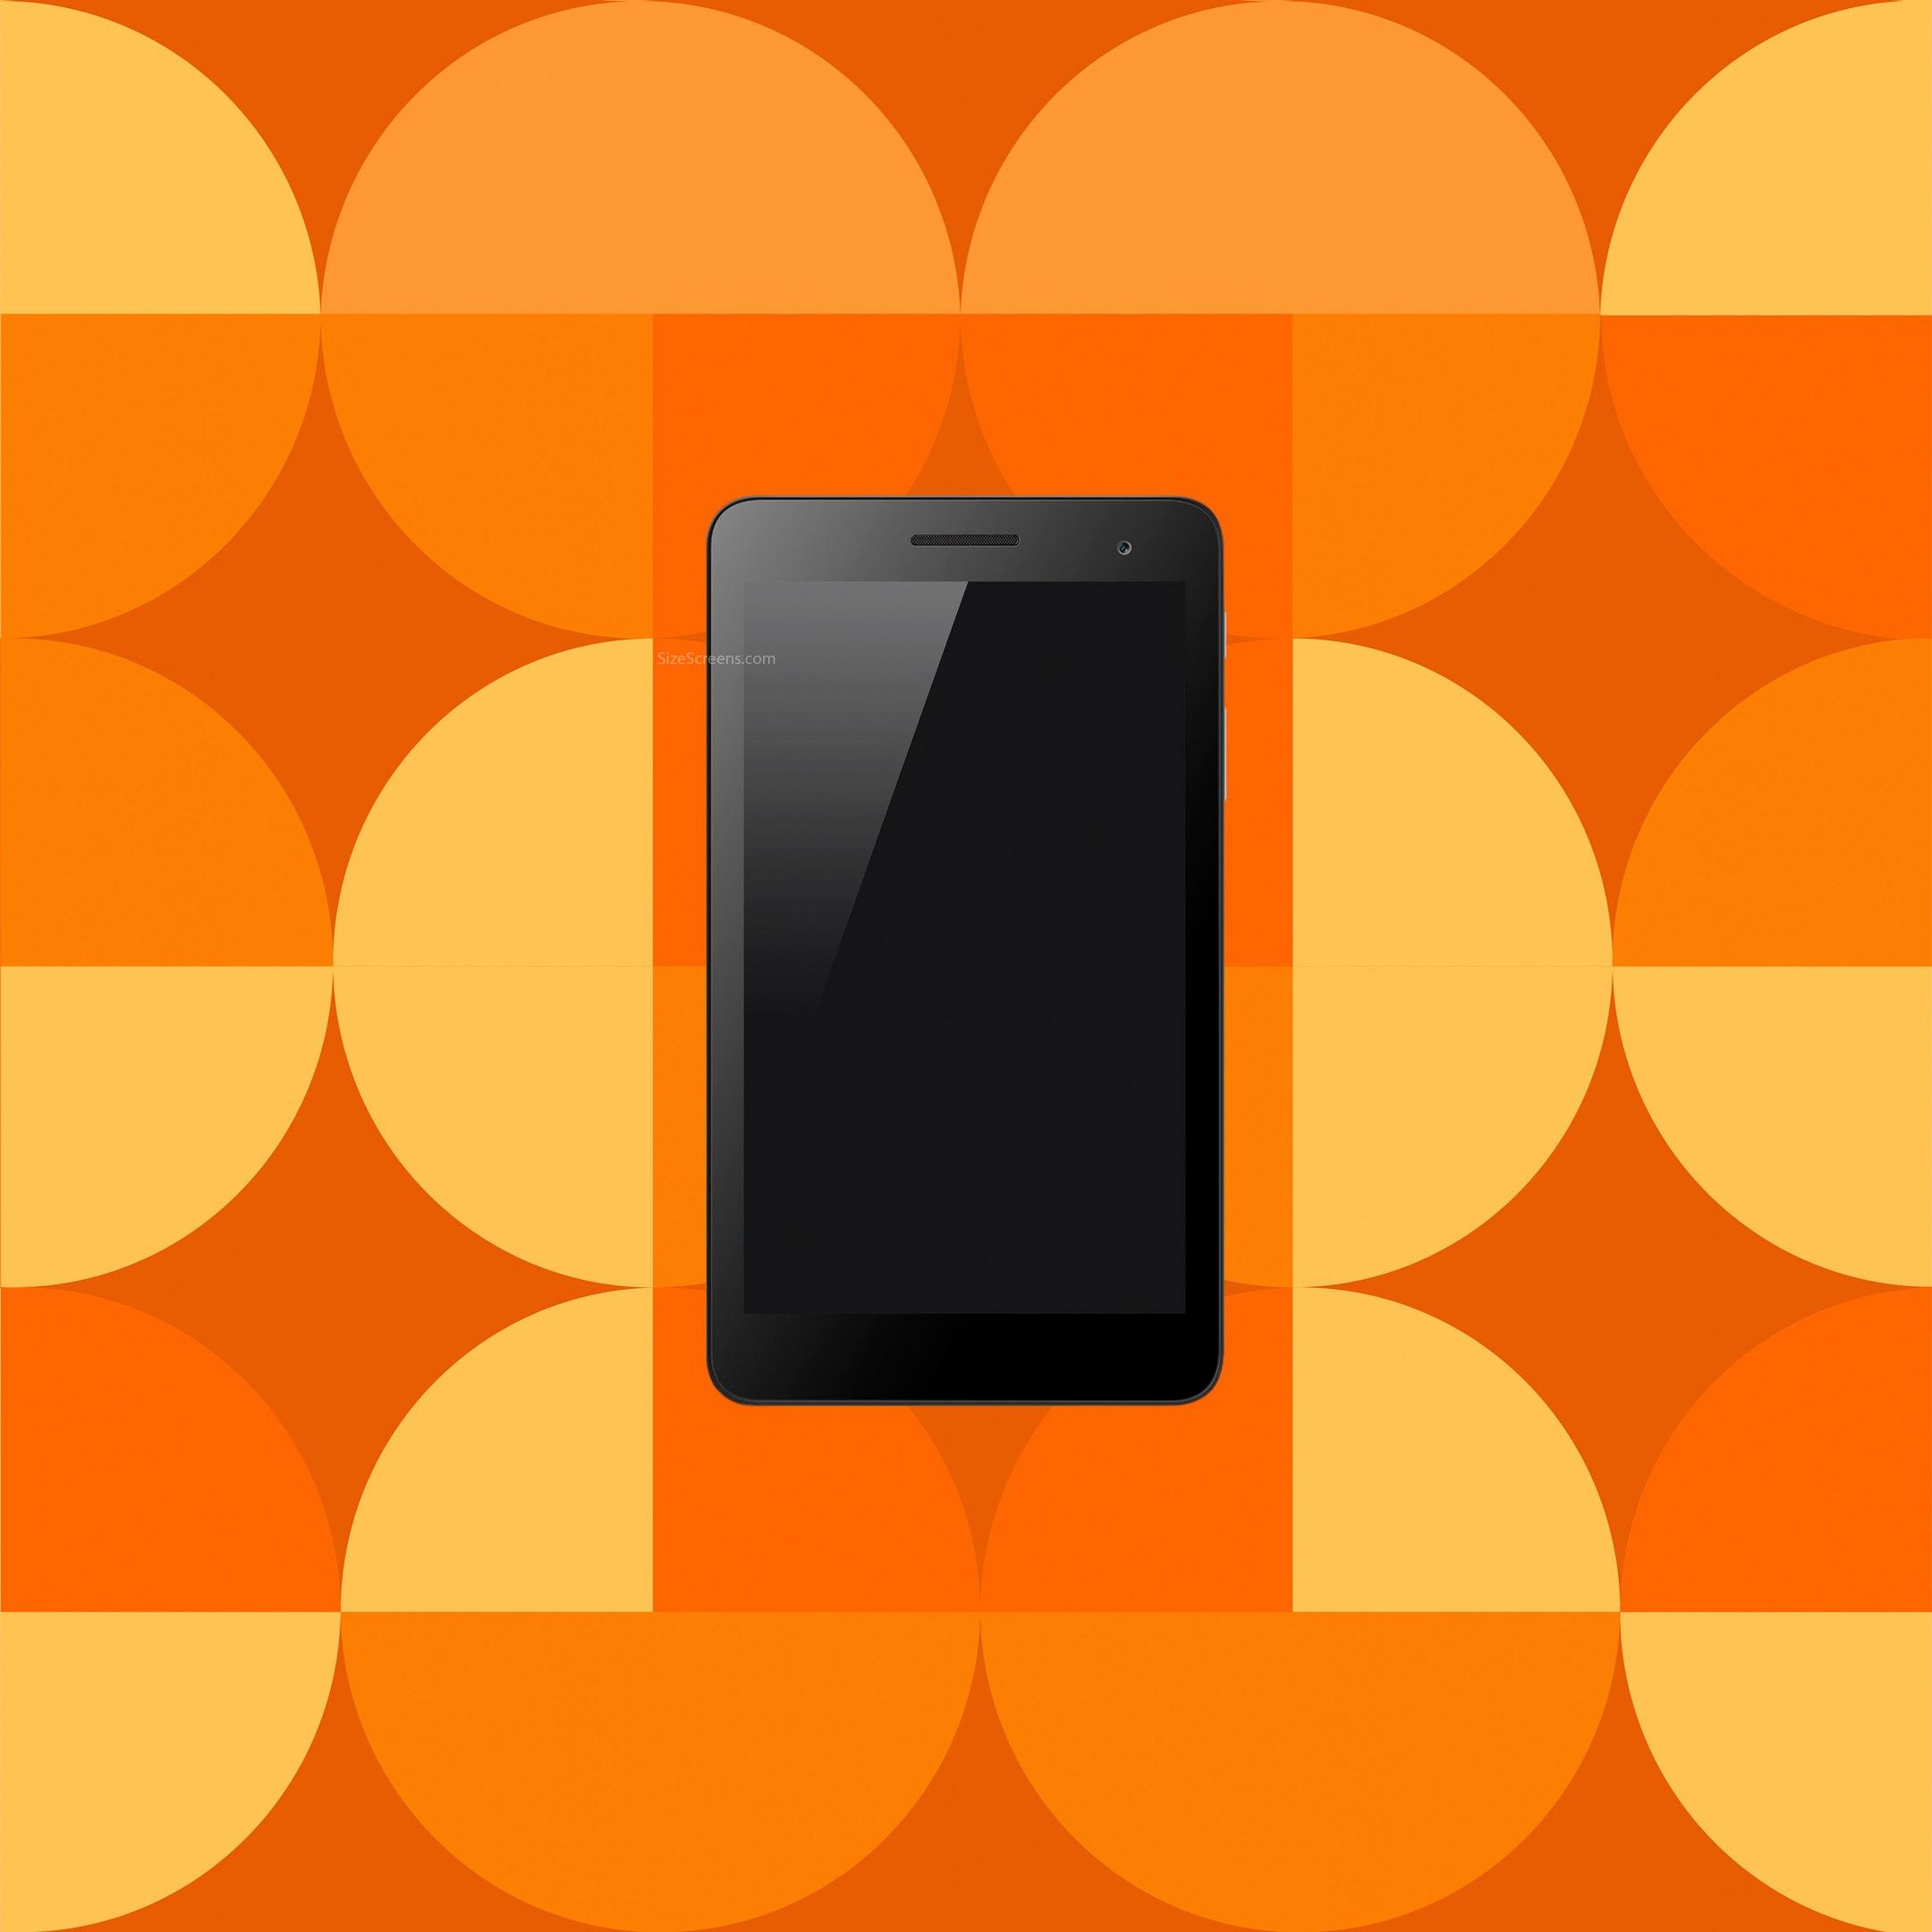 Harga Huawei Mediapad T1 7 Update 2018 Tcash Vaganza 17 Botol Minum Olahraga Discovery 750ml Hitam 70 Plus Screen Specifications